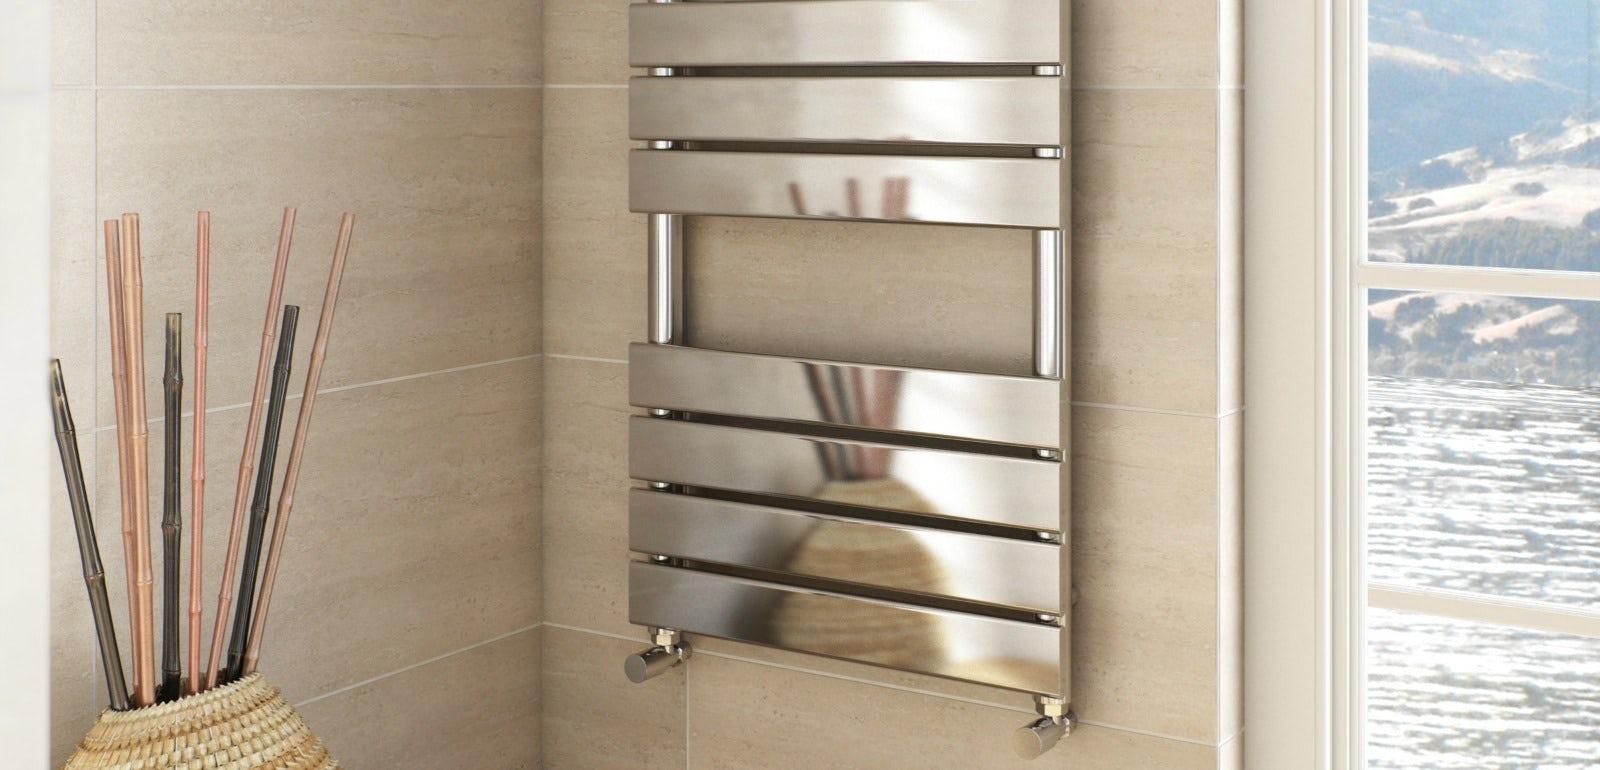 Designer heated towel rails for bathrooms - Designer Heated Towel Rails For Bathrooms Home Decorations Design List Of Things